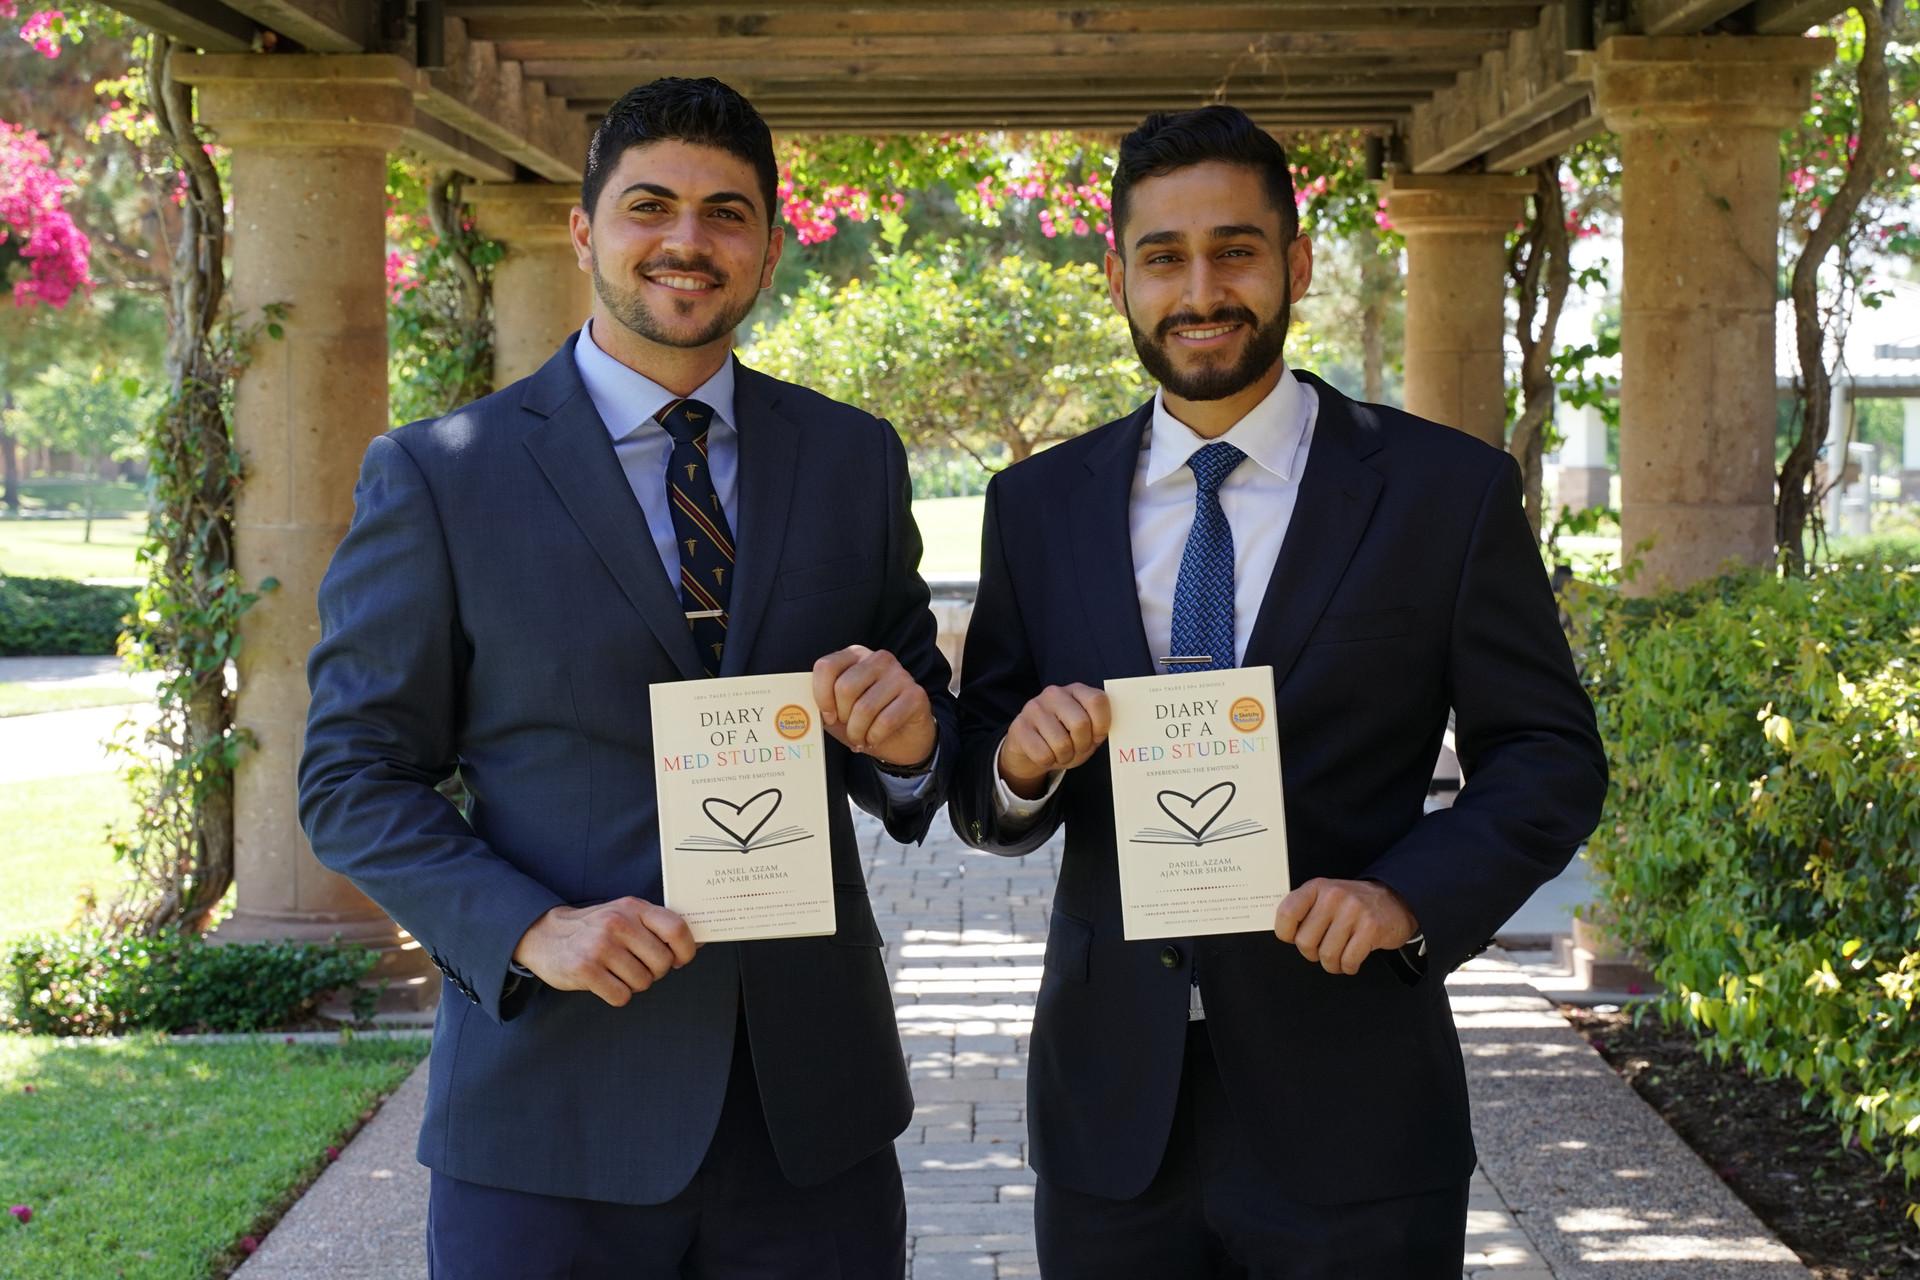 Daniel Azzam and Ajay Nair Sharma